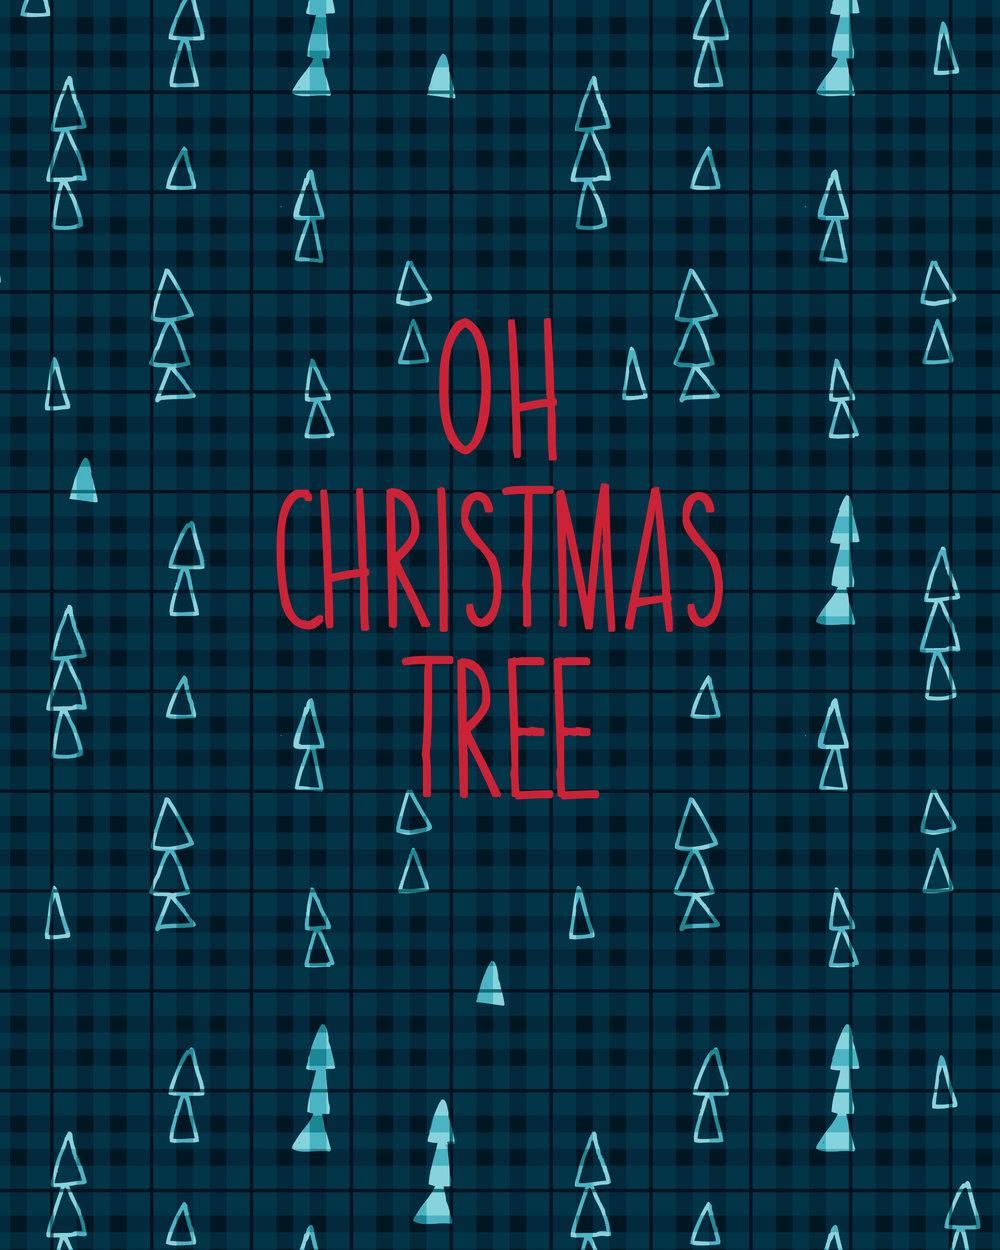 Oh Christmas Tree, 8x10 Digital Download Print — THE ART IN TARA ...